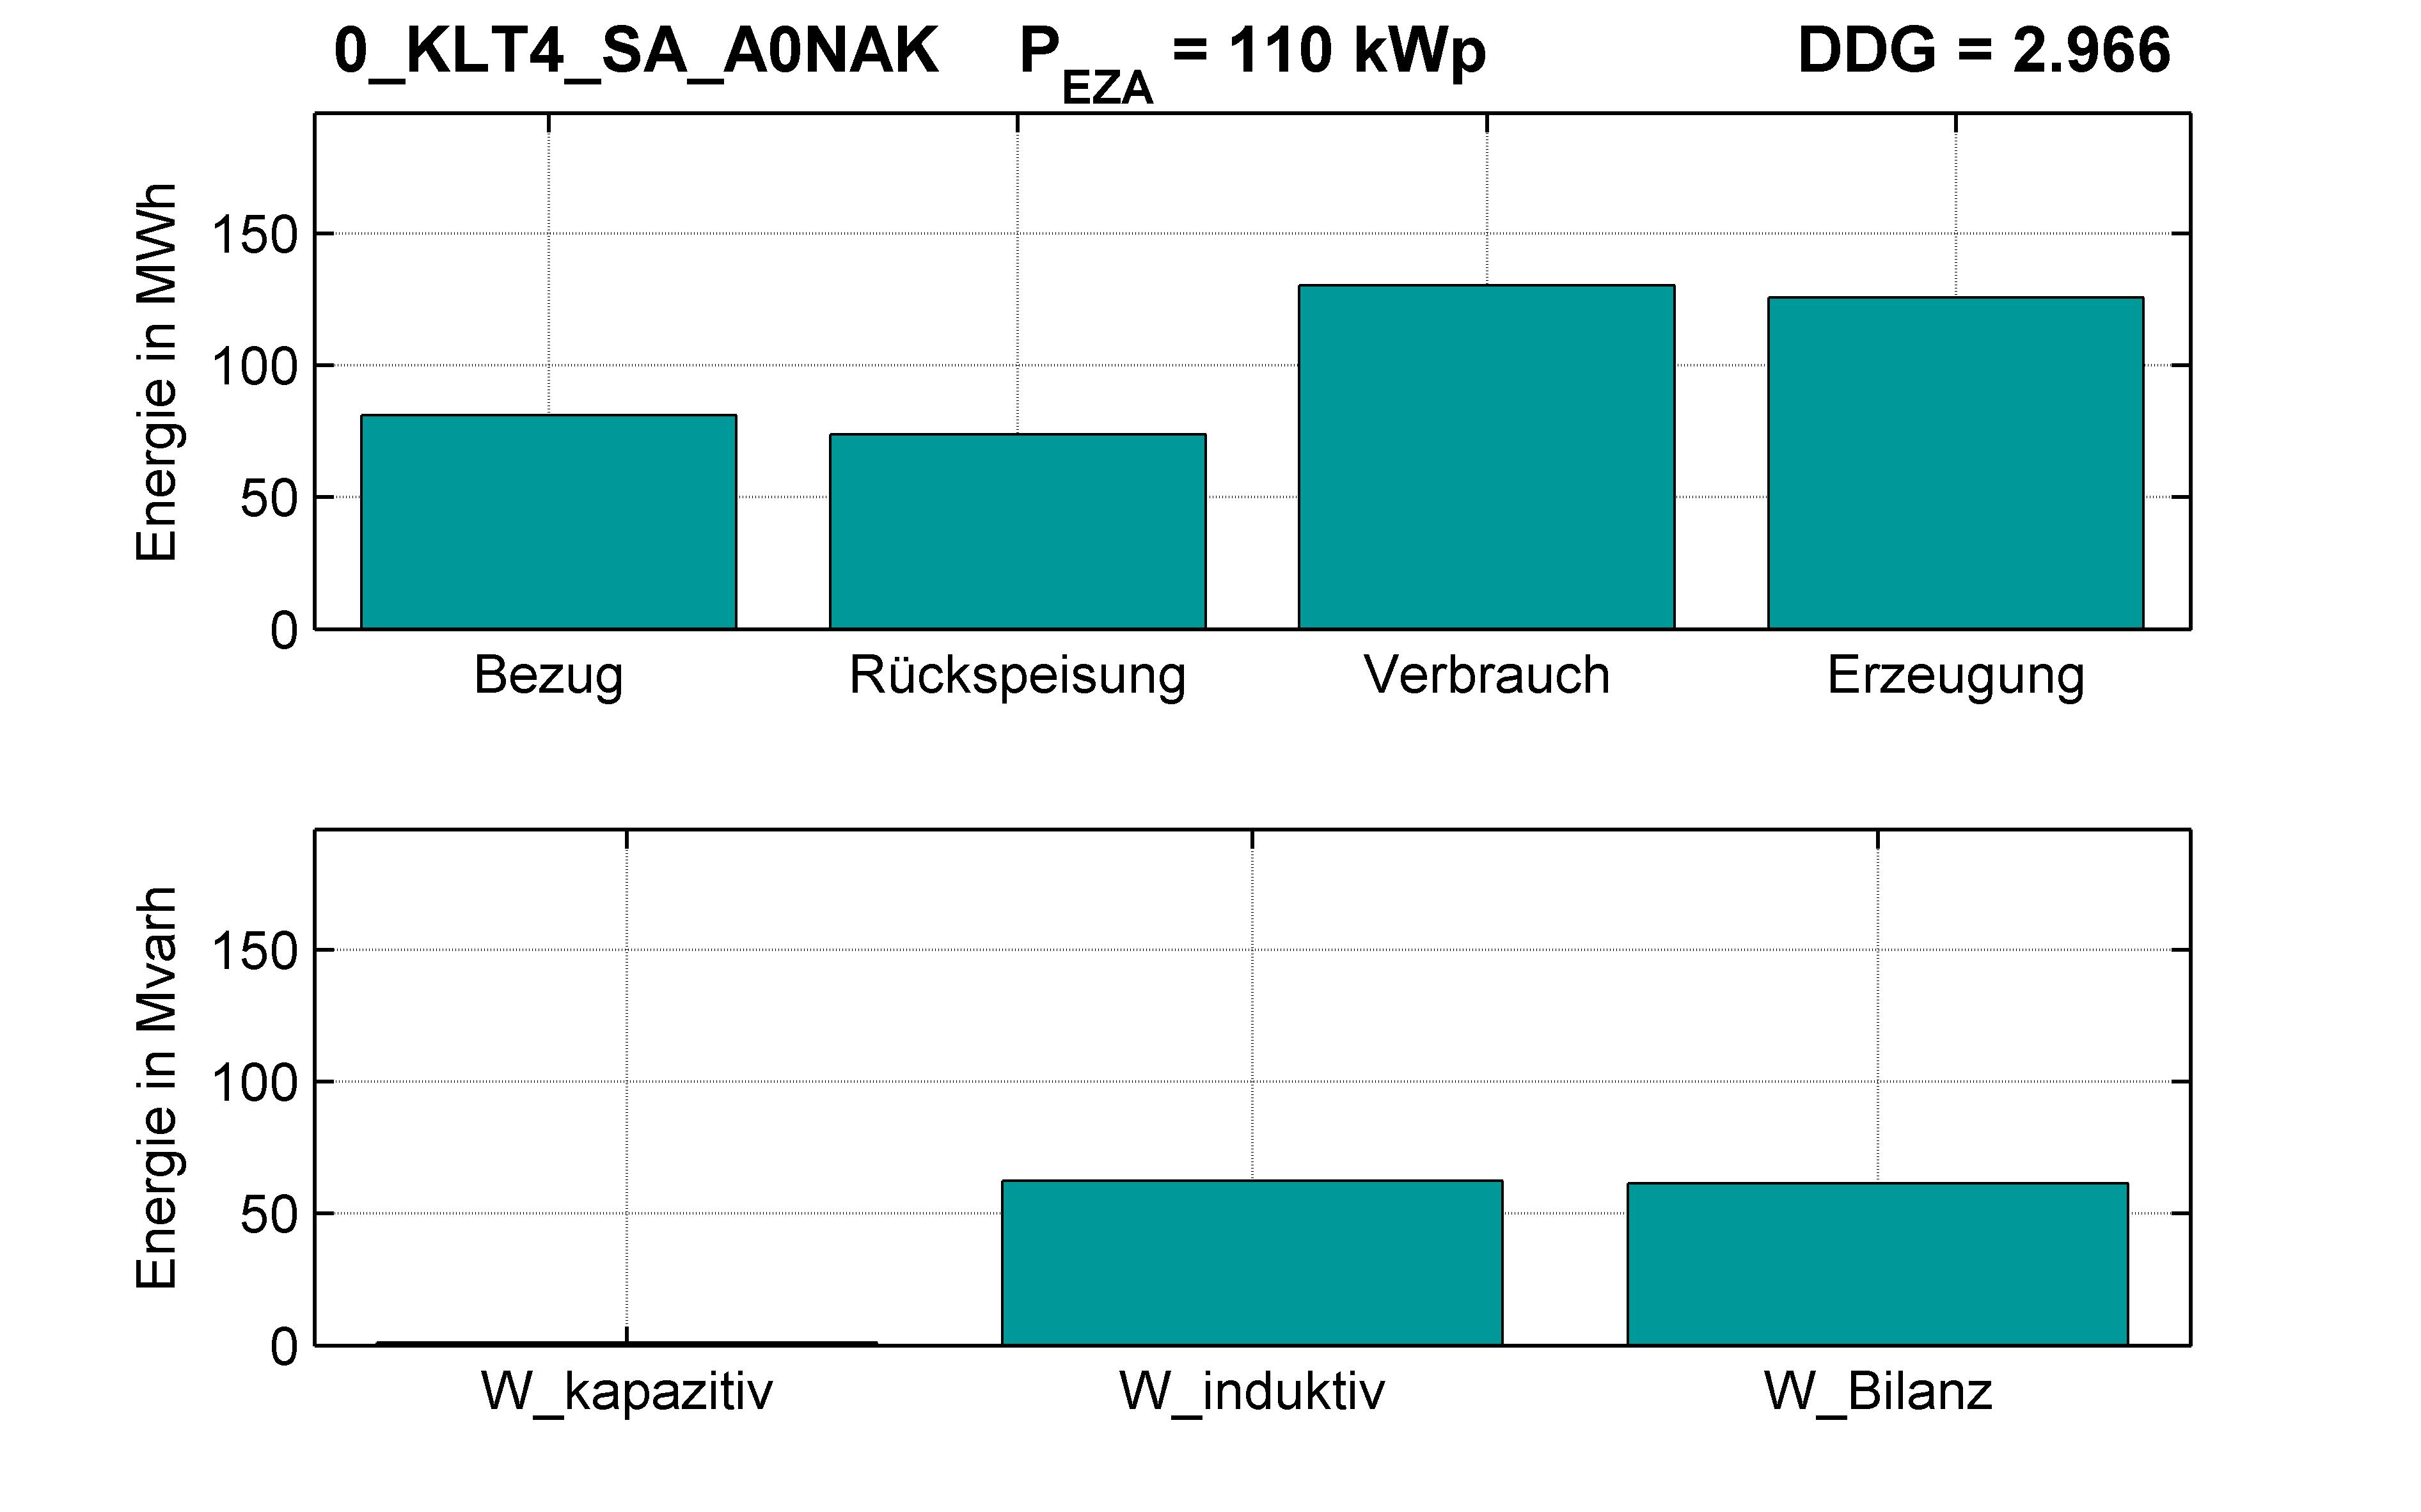 KLT4 | RONT (SA) A0NAK | PQ-Bilanz